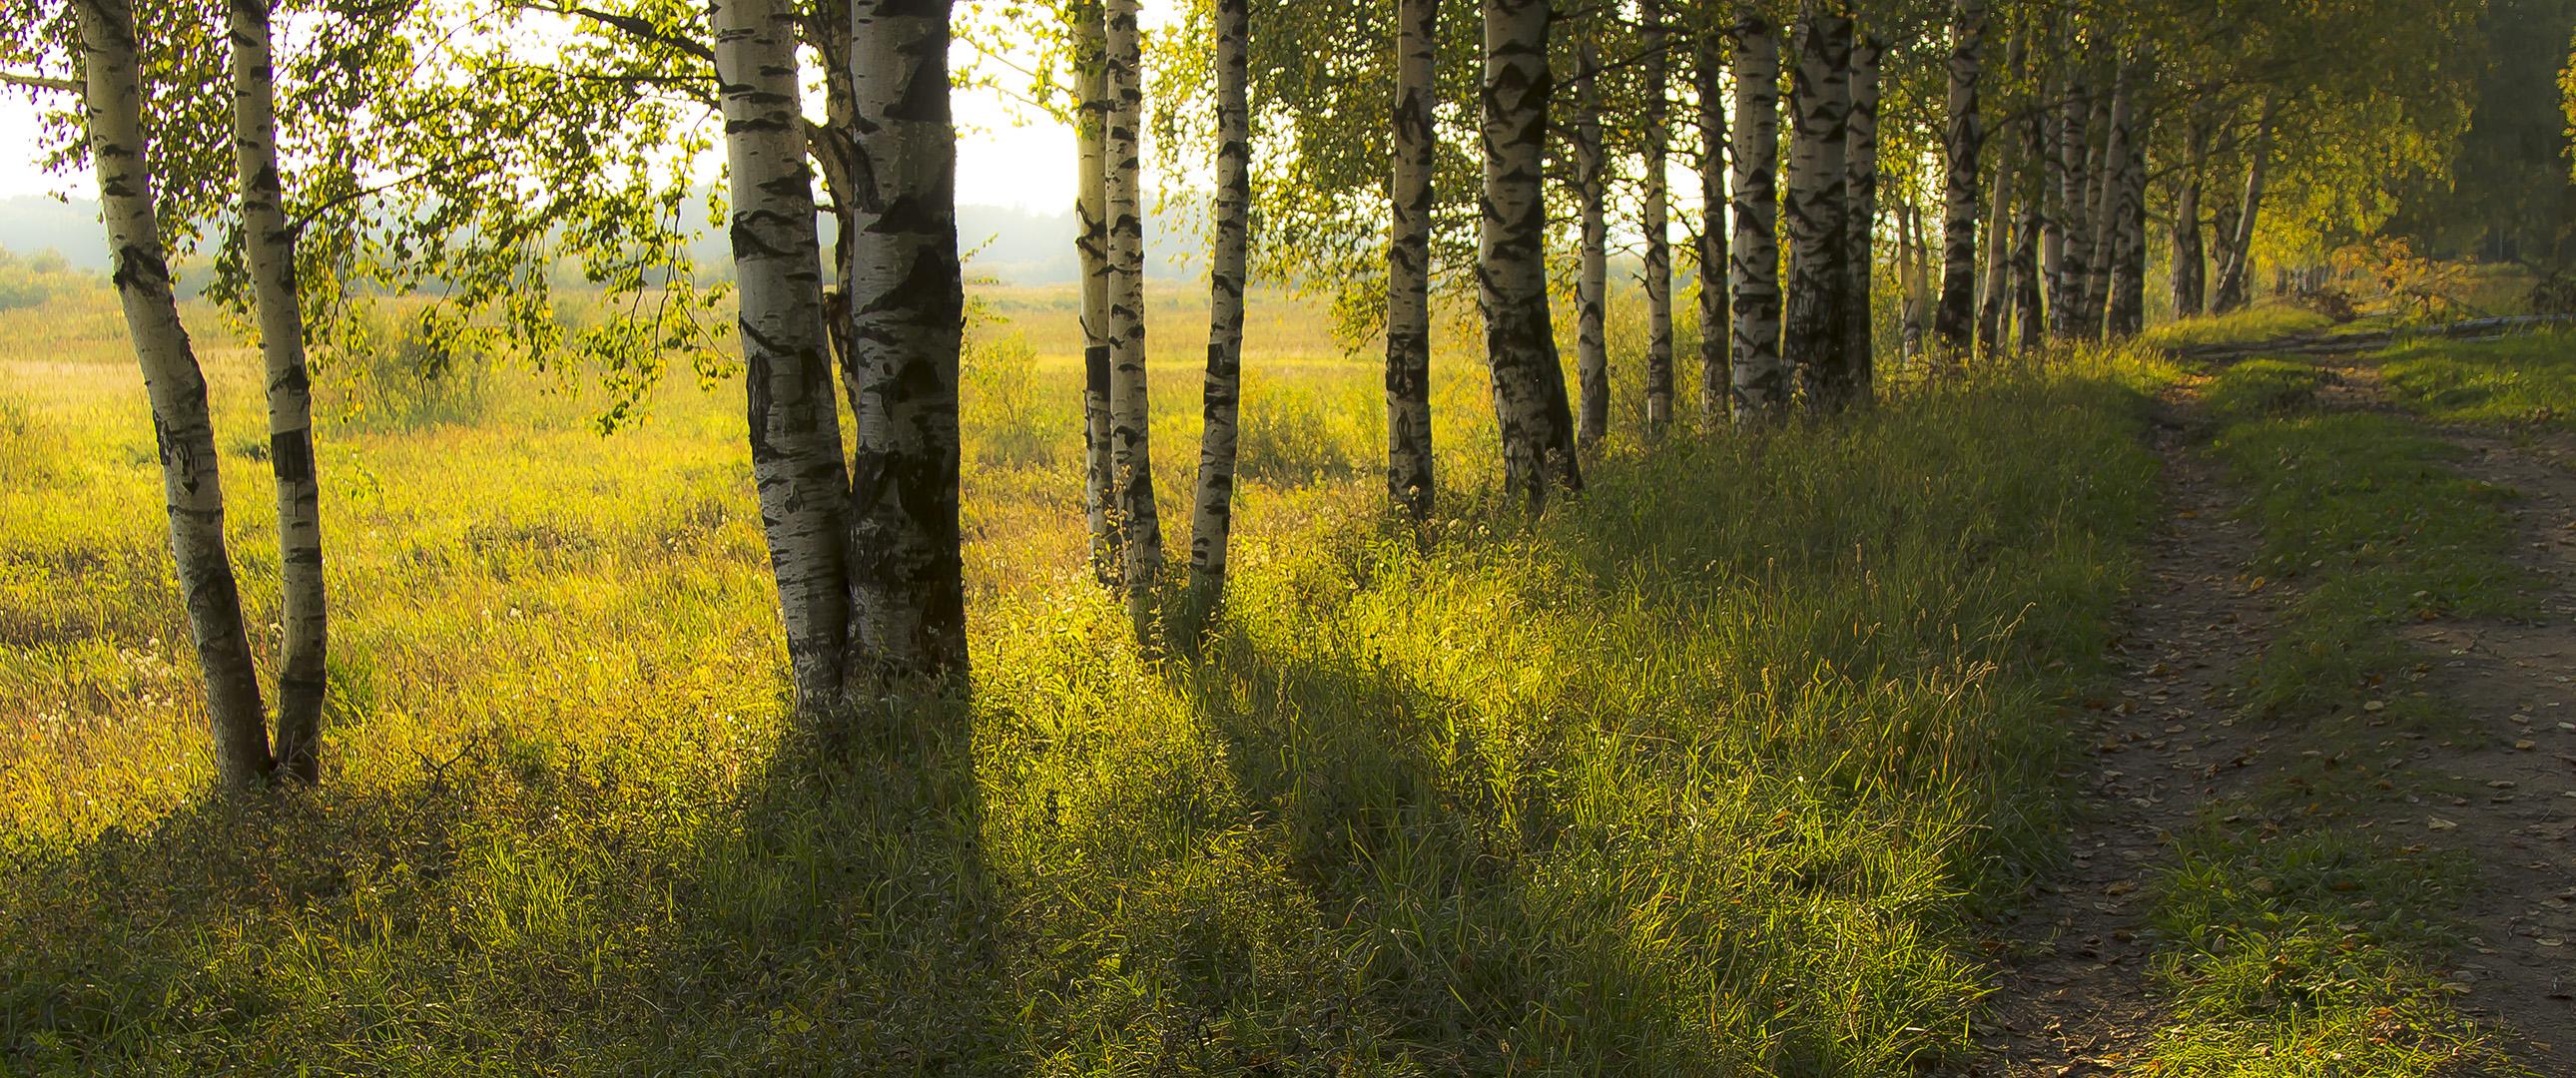 Обои тропа, осень, березы. Пейзажи foto 16